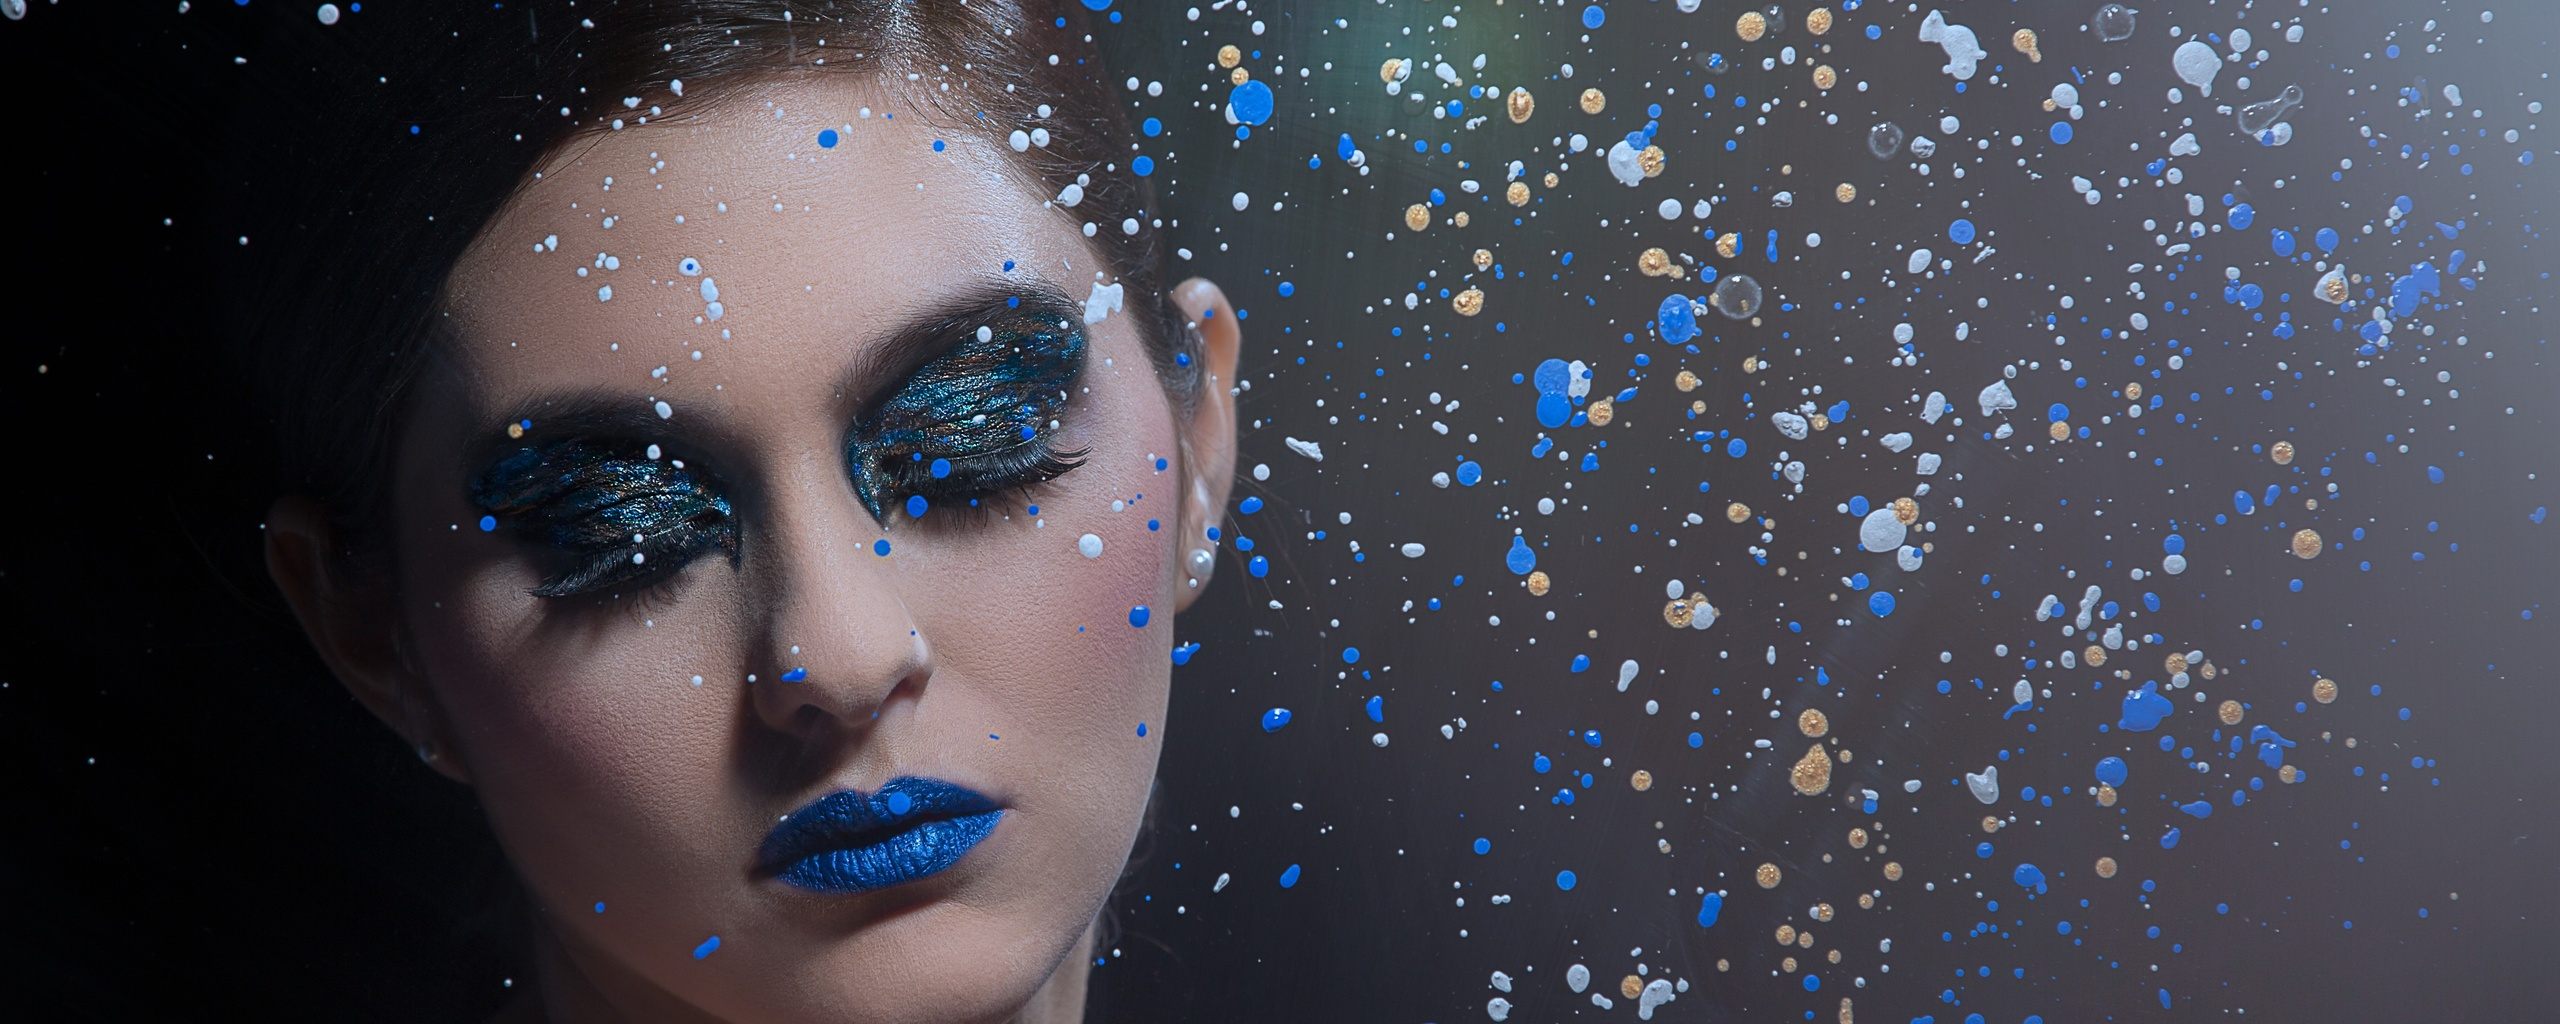 paints-drops-on-girl-face-5r.jpg